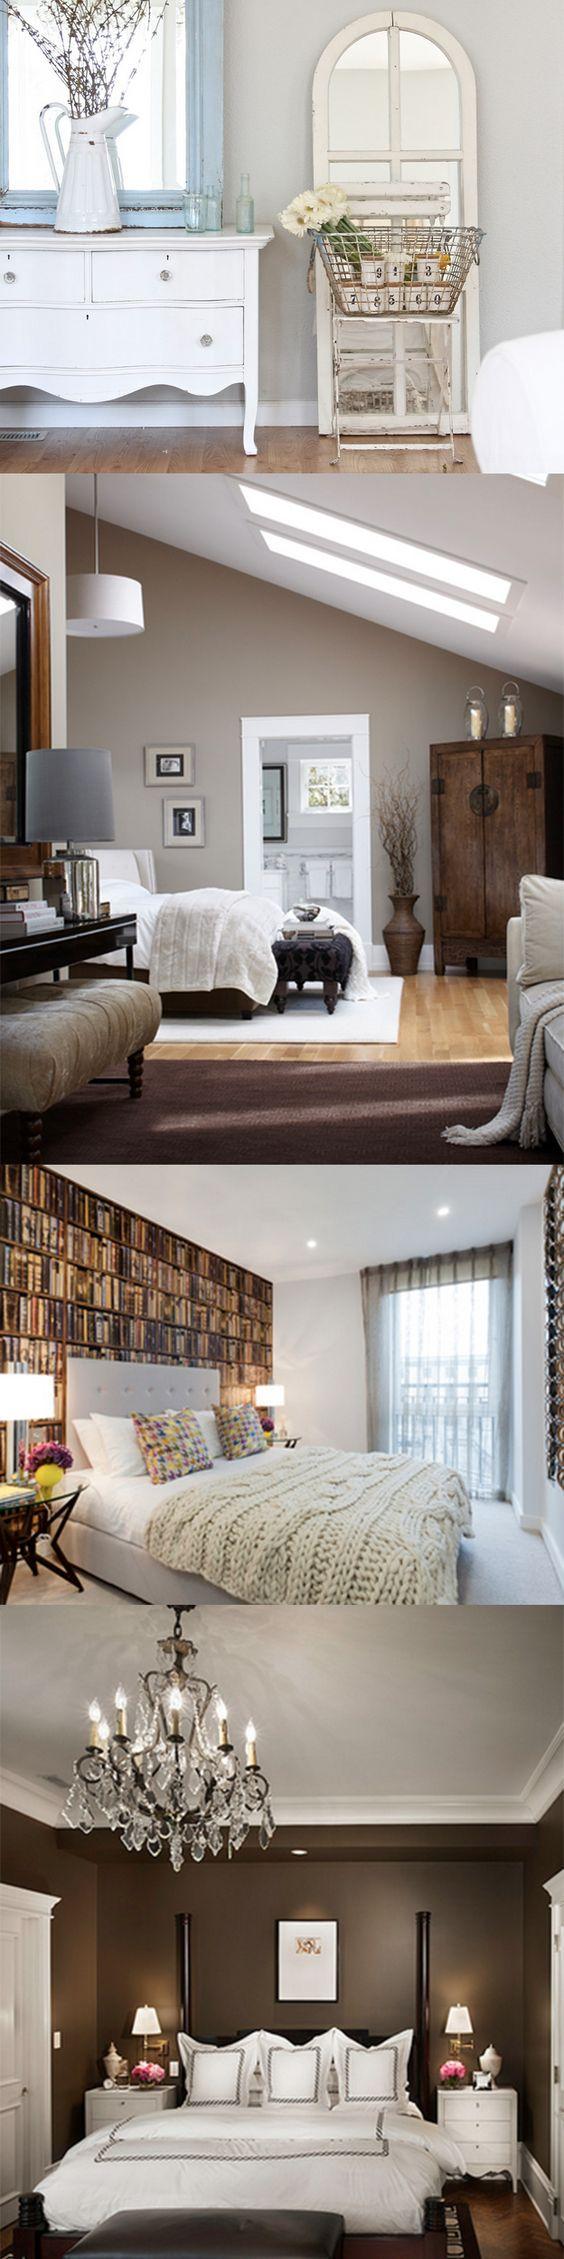 Muebles Hipopotamo Como Decorar Dormitorio Habitacion Matrimonio  # Muebles Hipopotamo